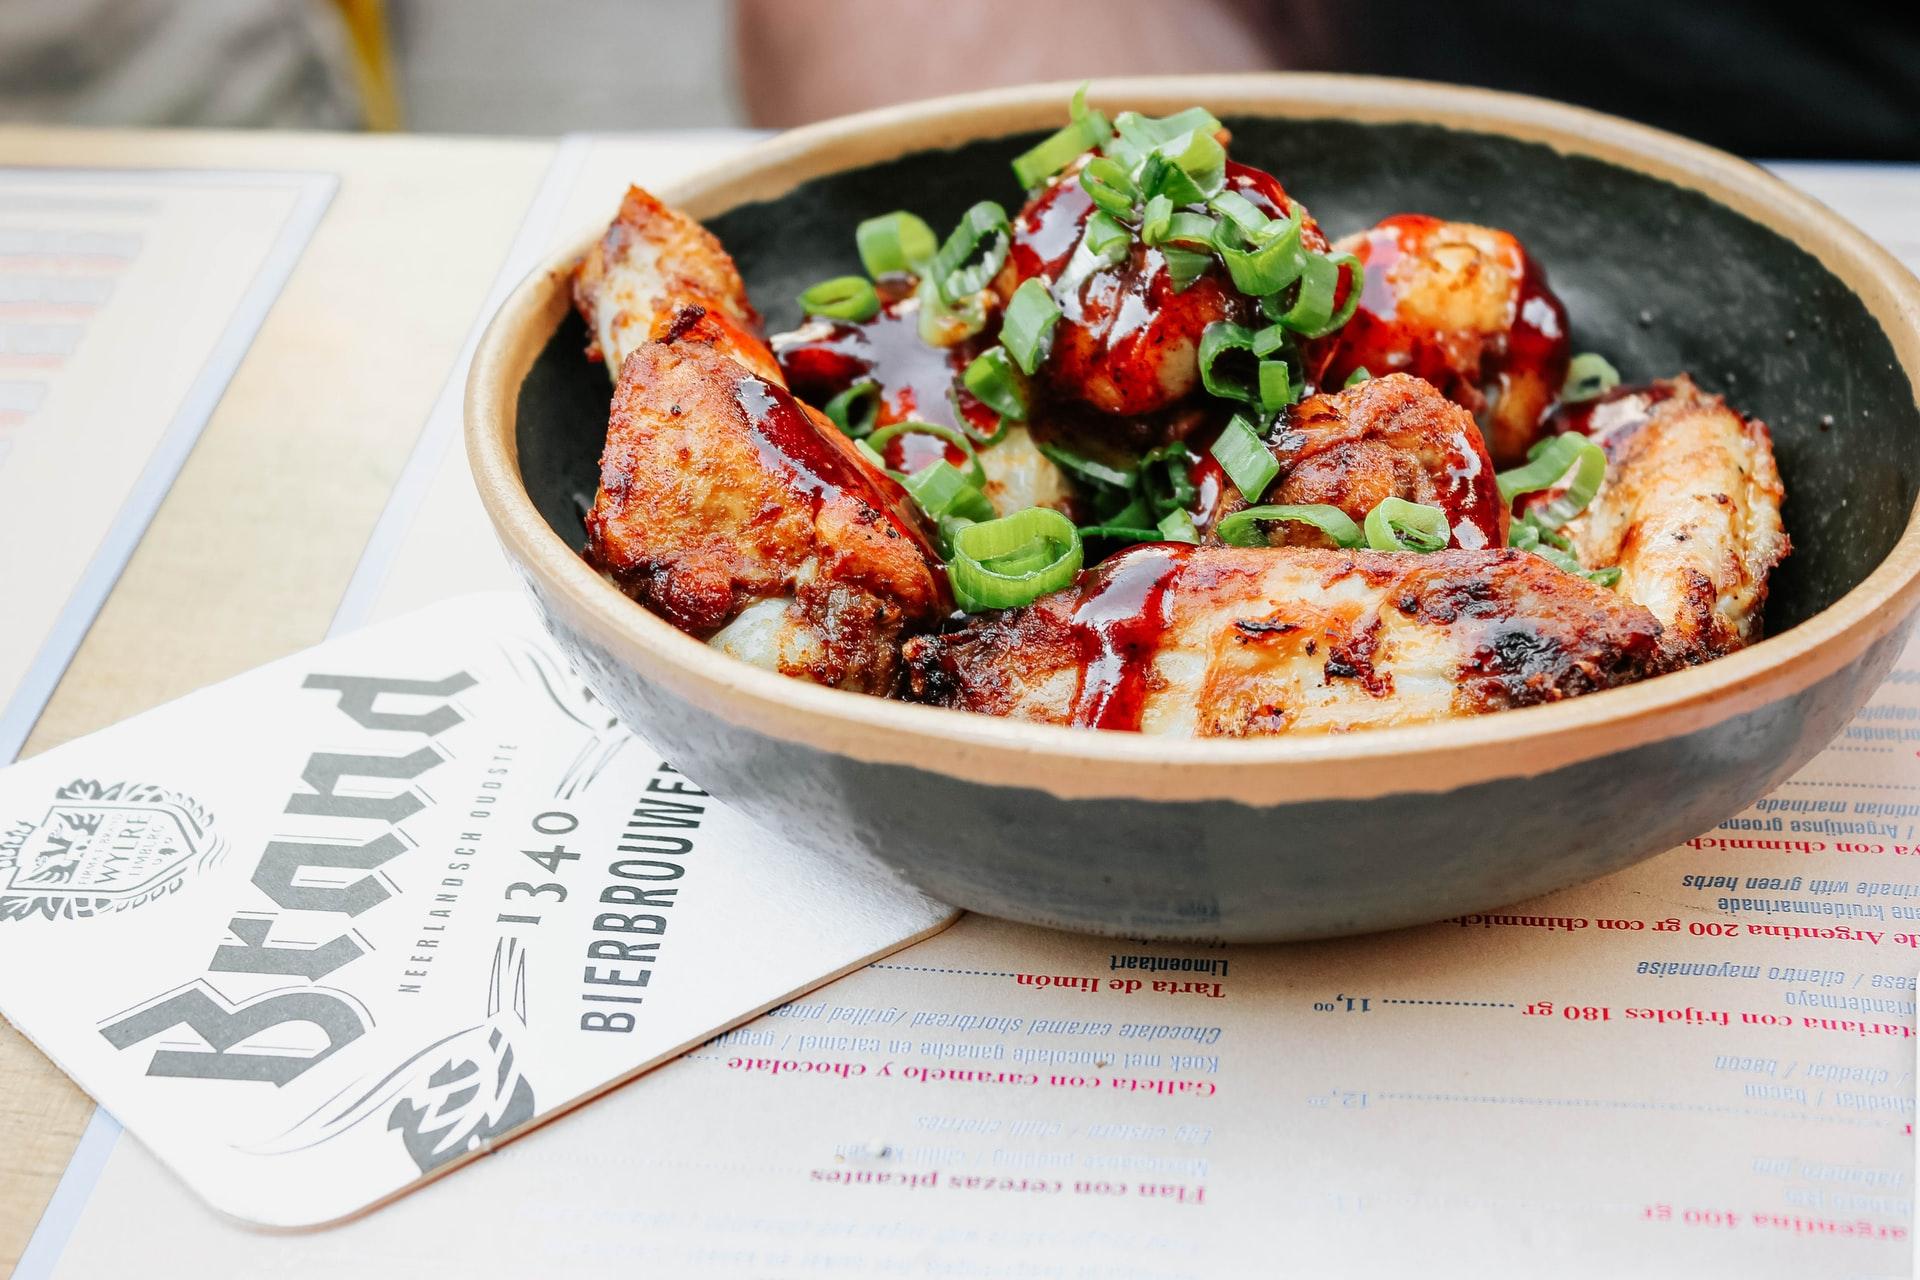 Pollo spagnolo con chorizo e peperoni